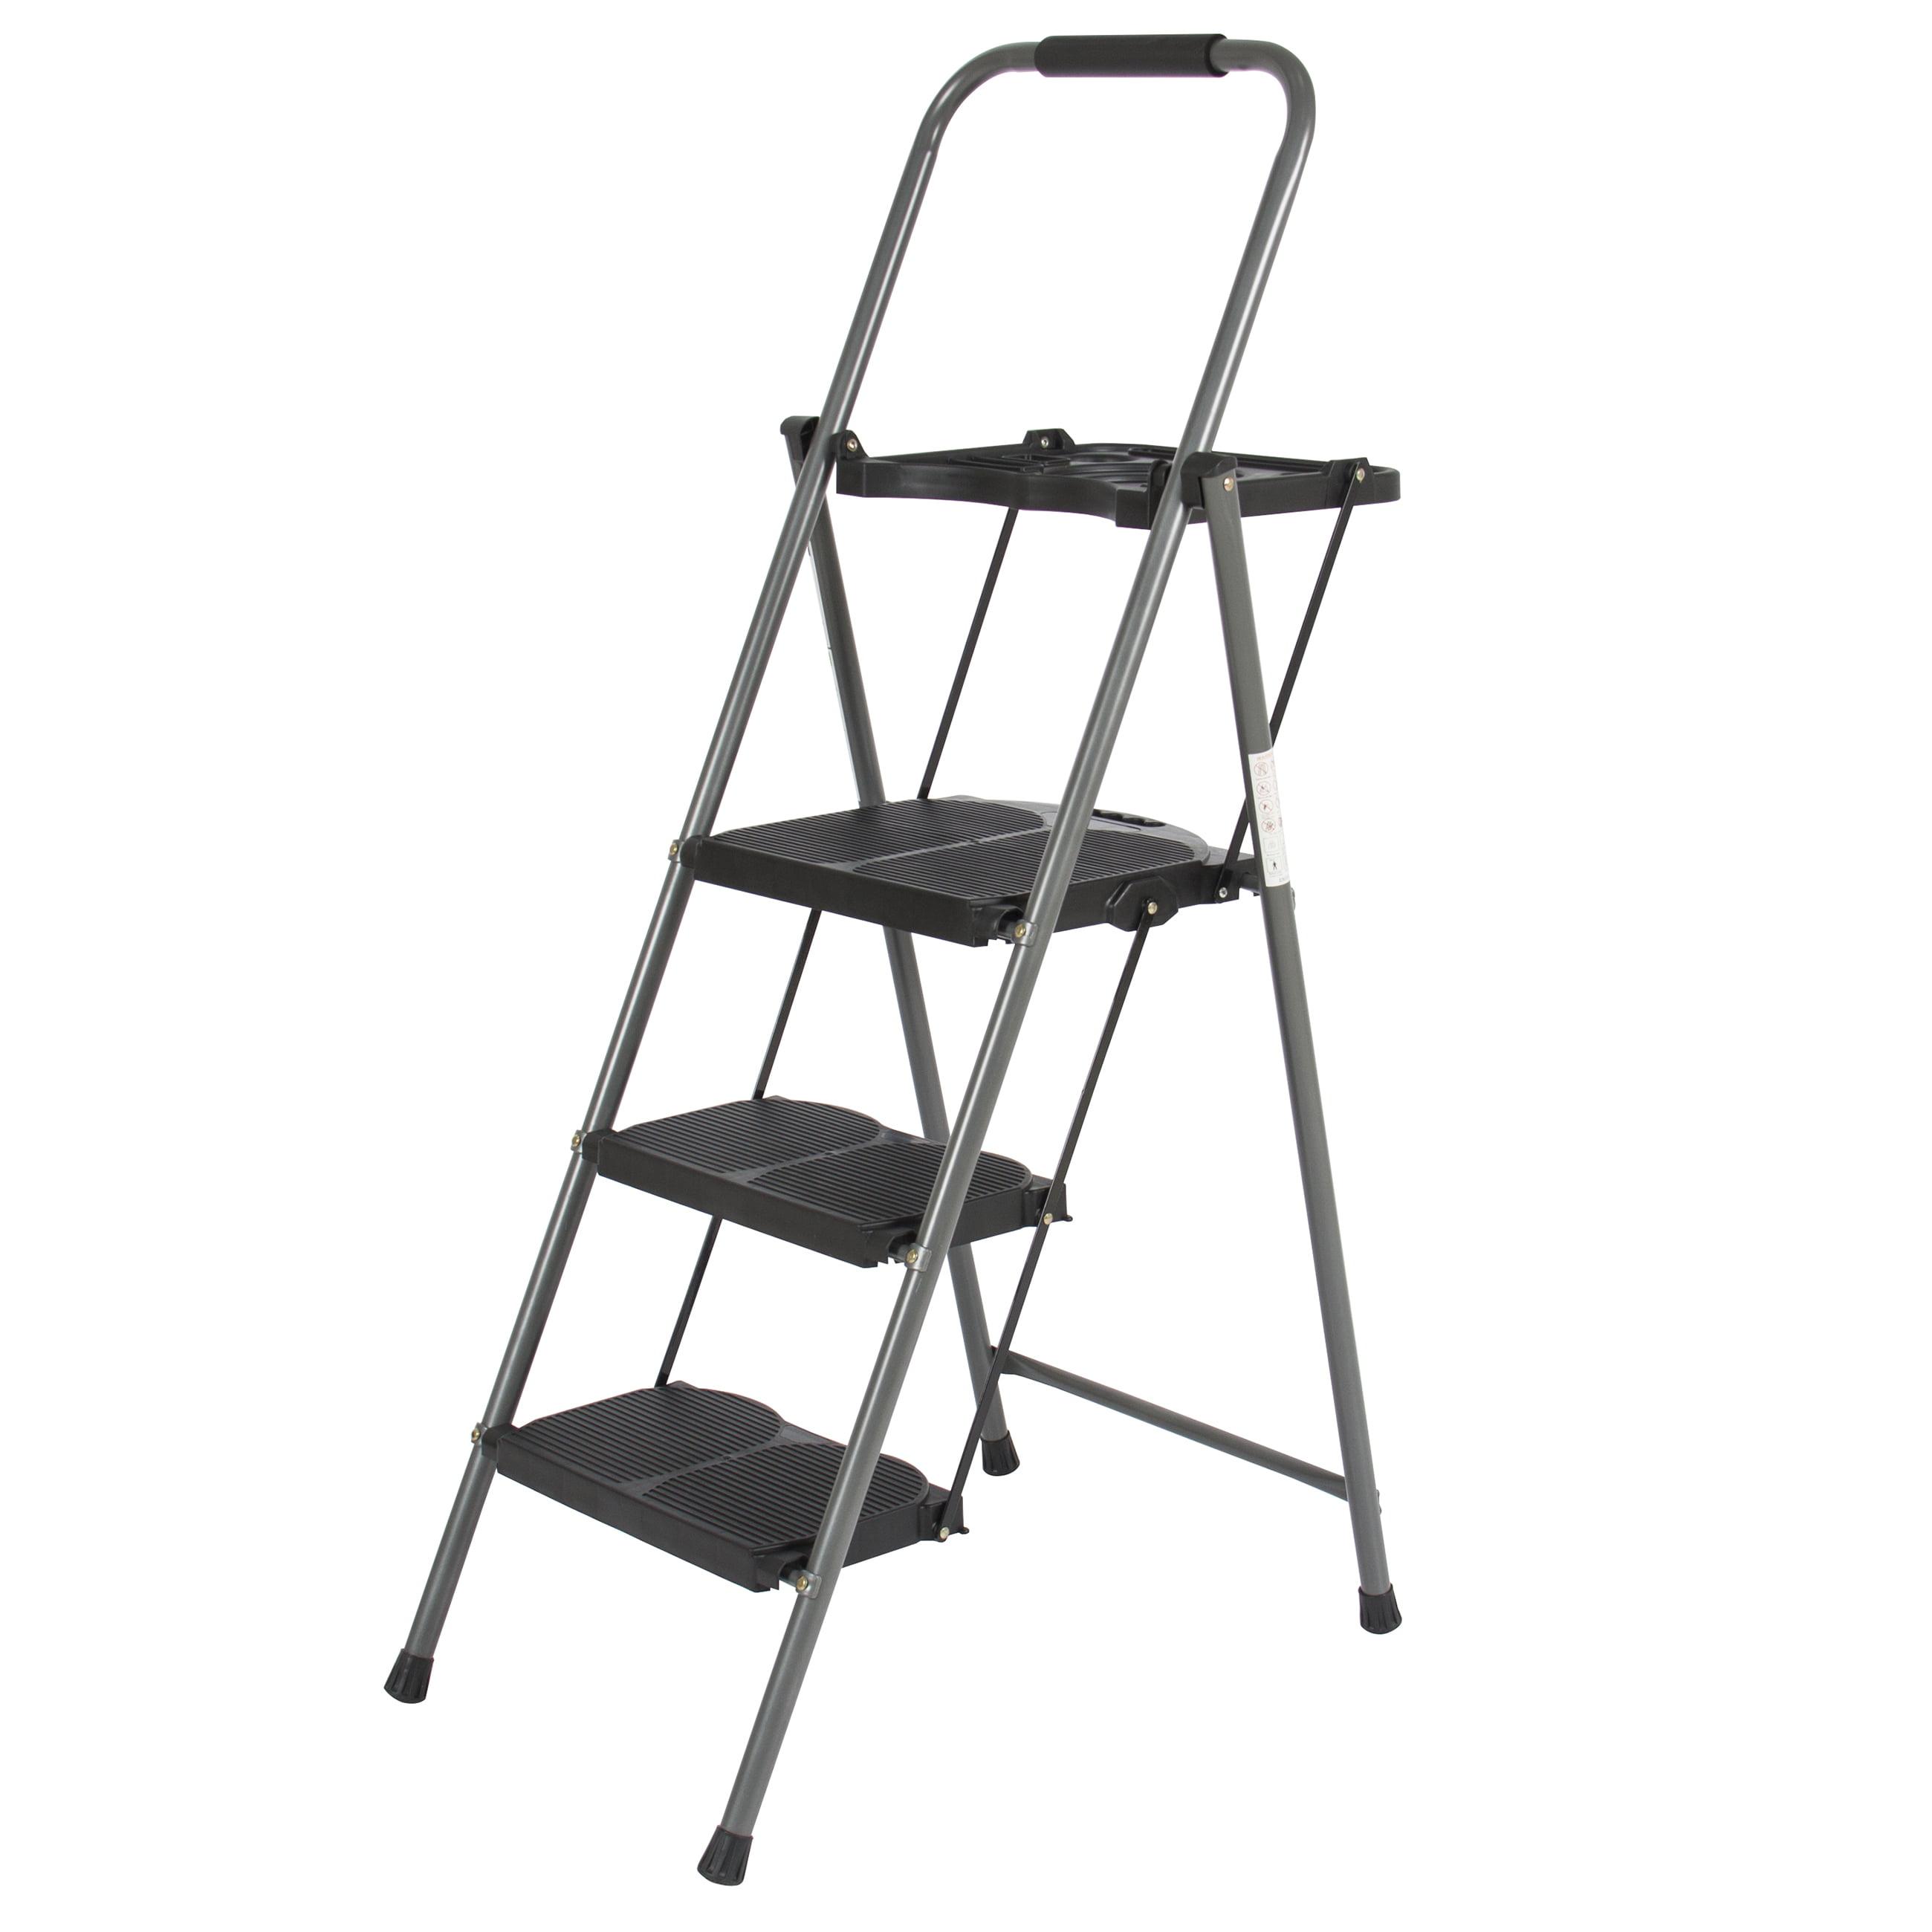 3 Step Ladder Platform Lightweight Folding Stool 330 Lbs